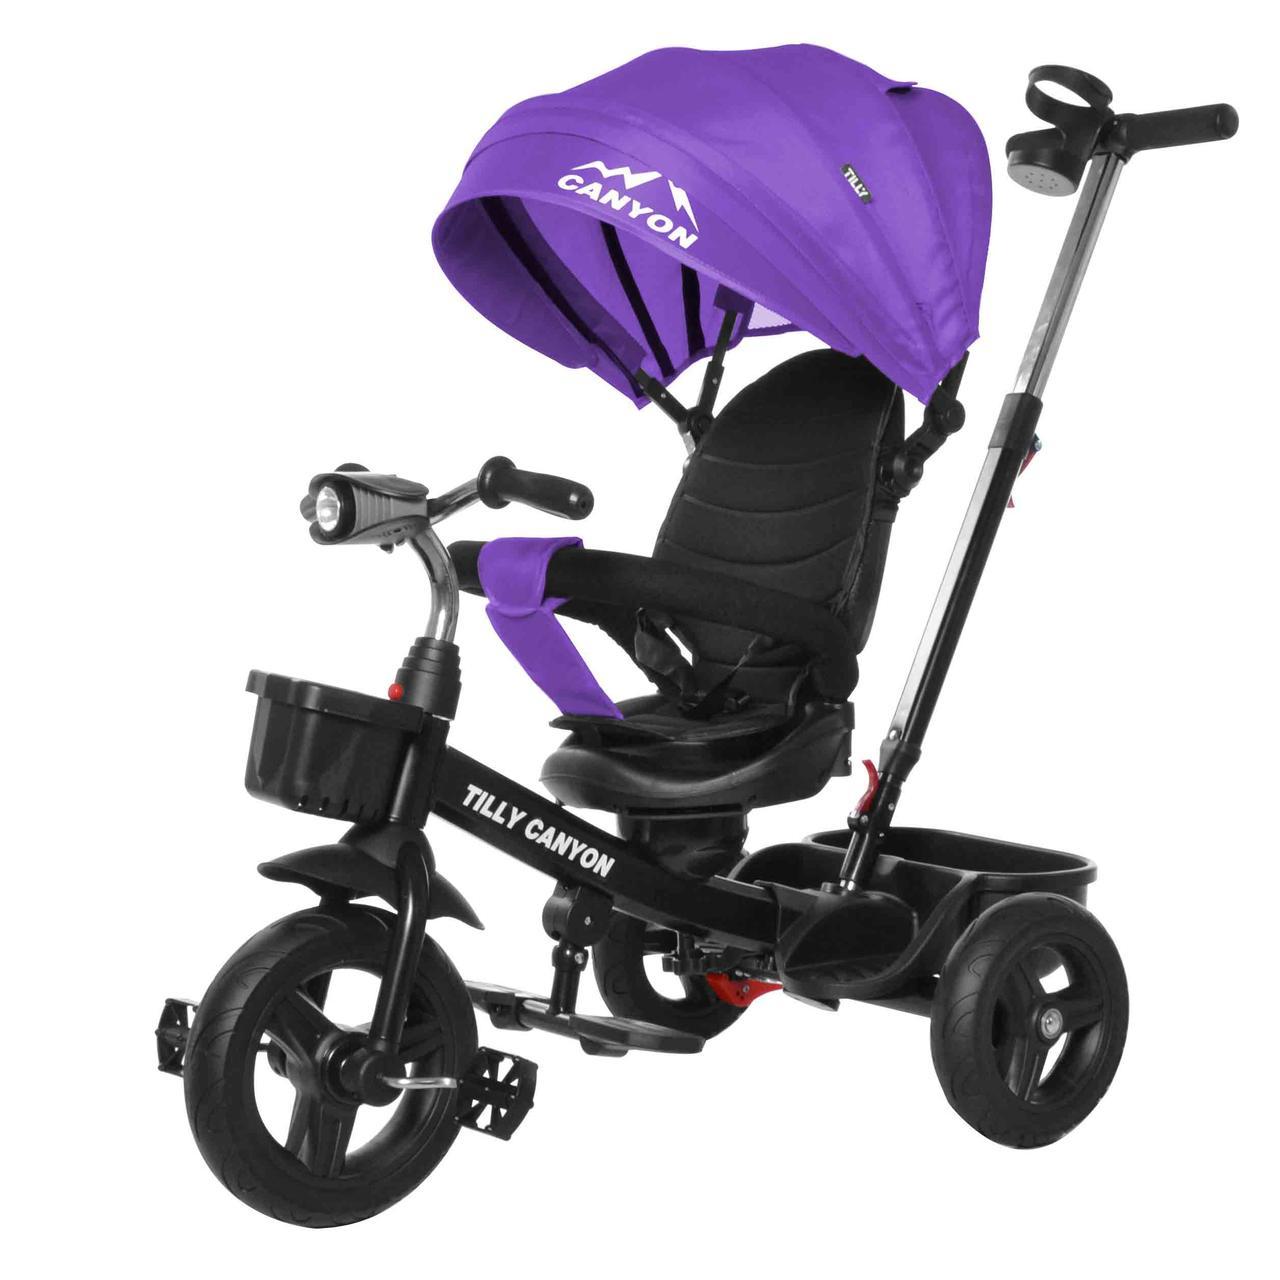 Велосипед трехколесный TILLY CANYON T-384 Фіолетовий